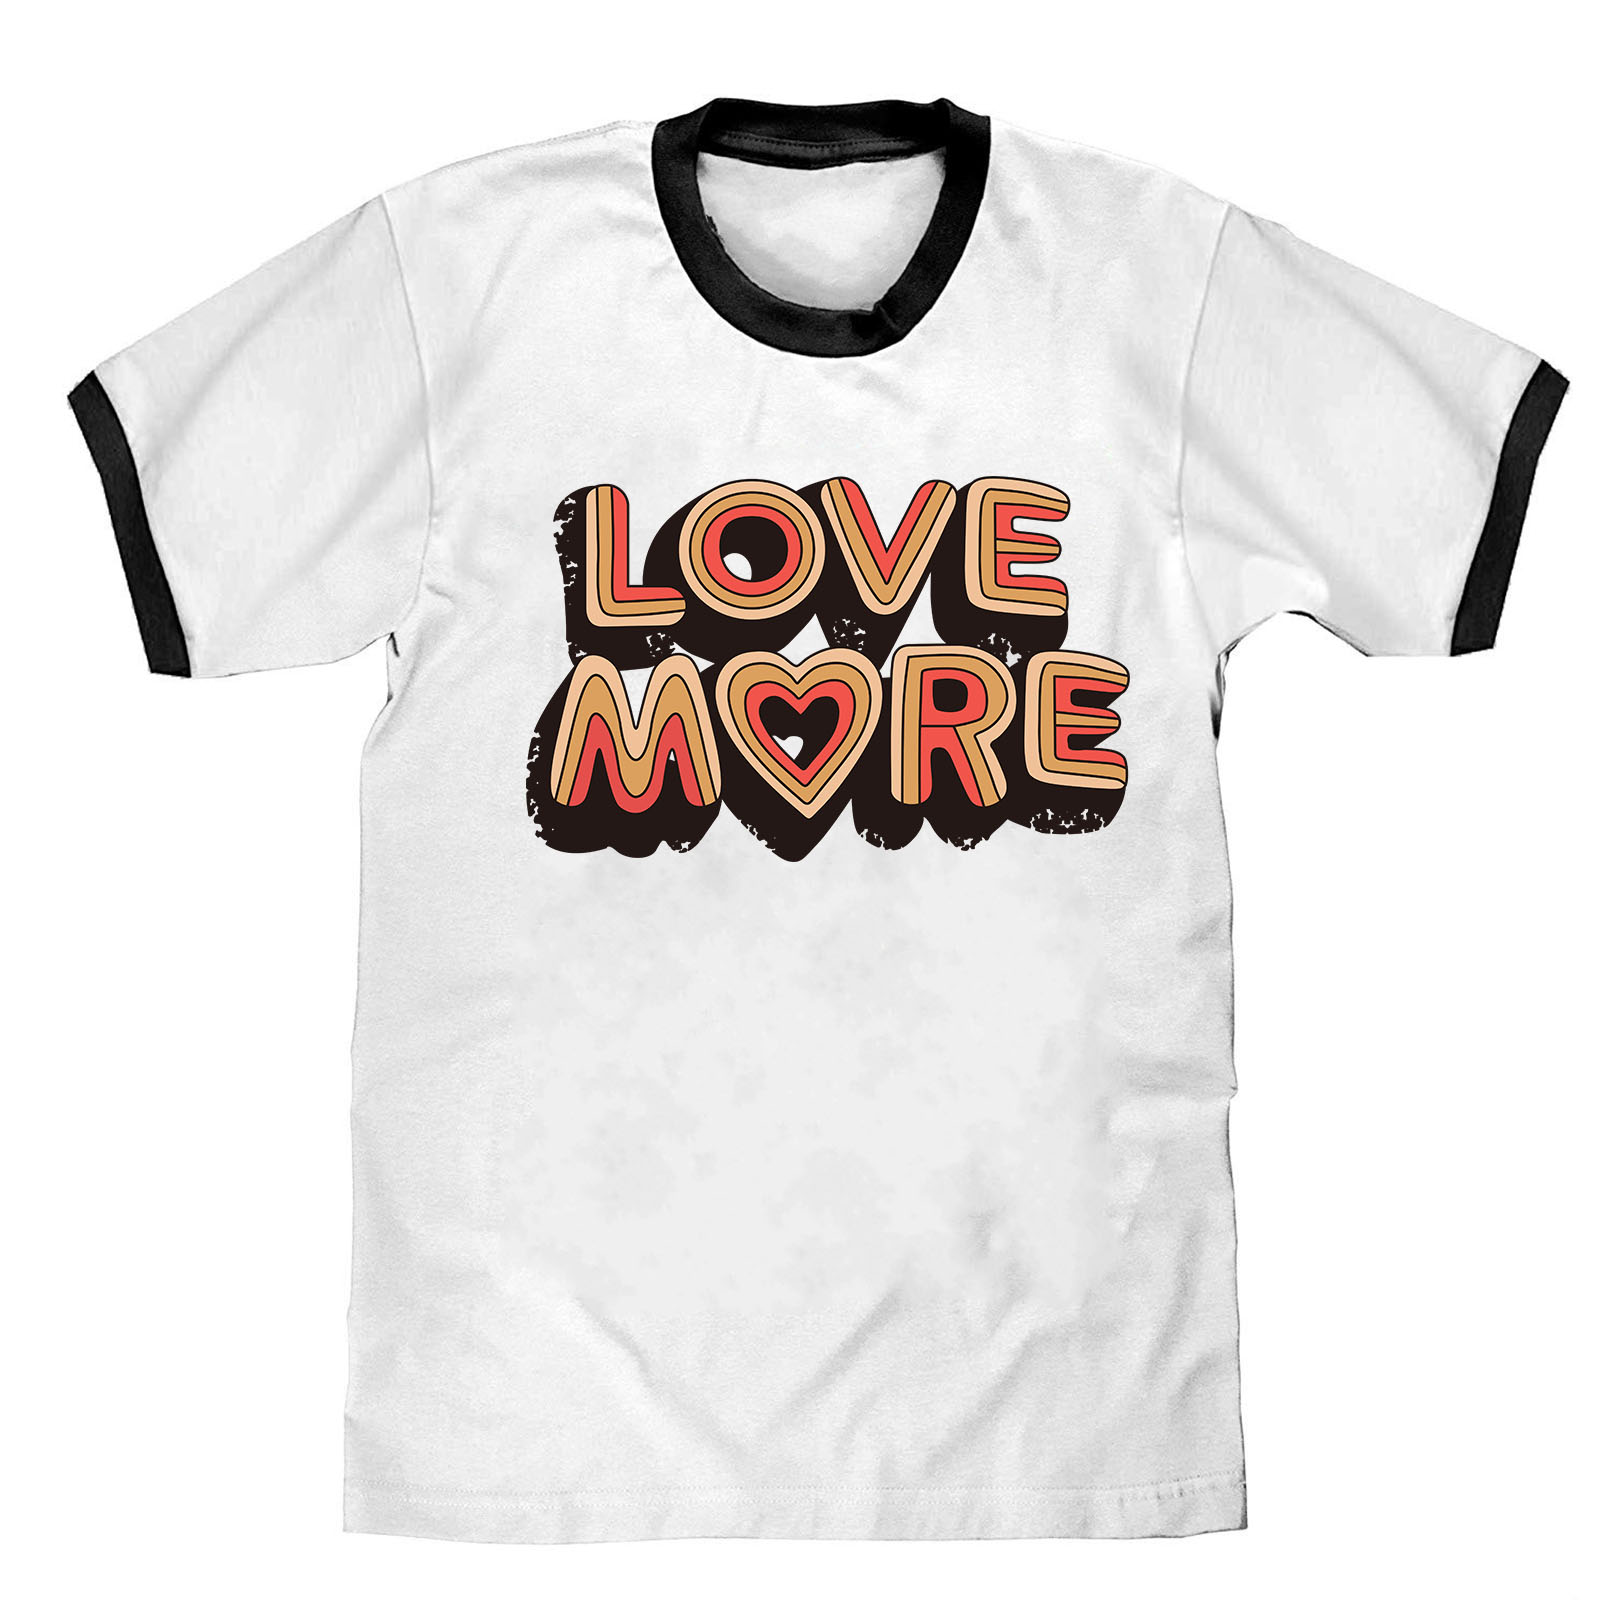 Love more Tee